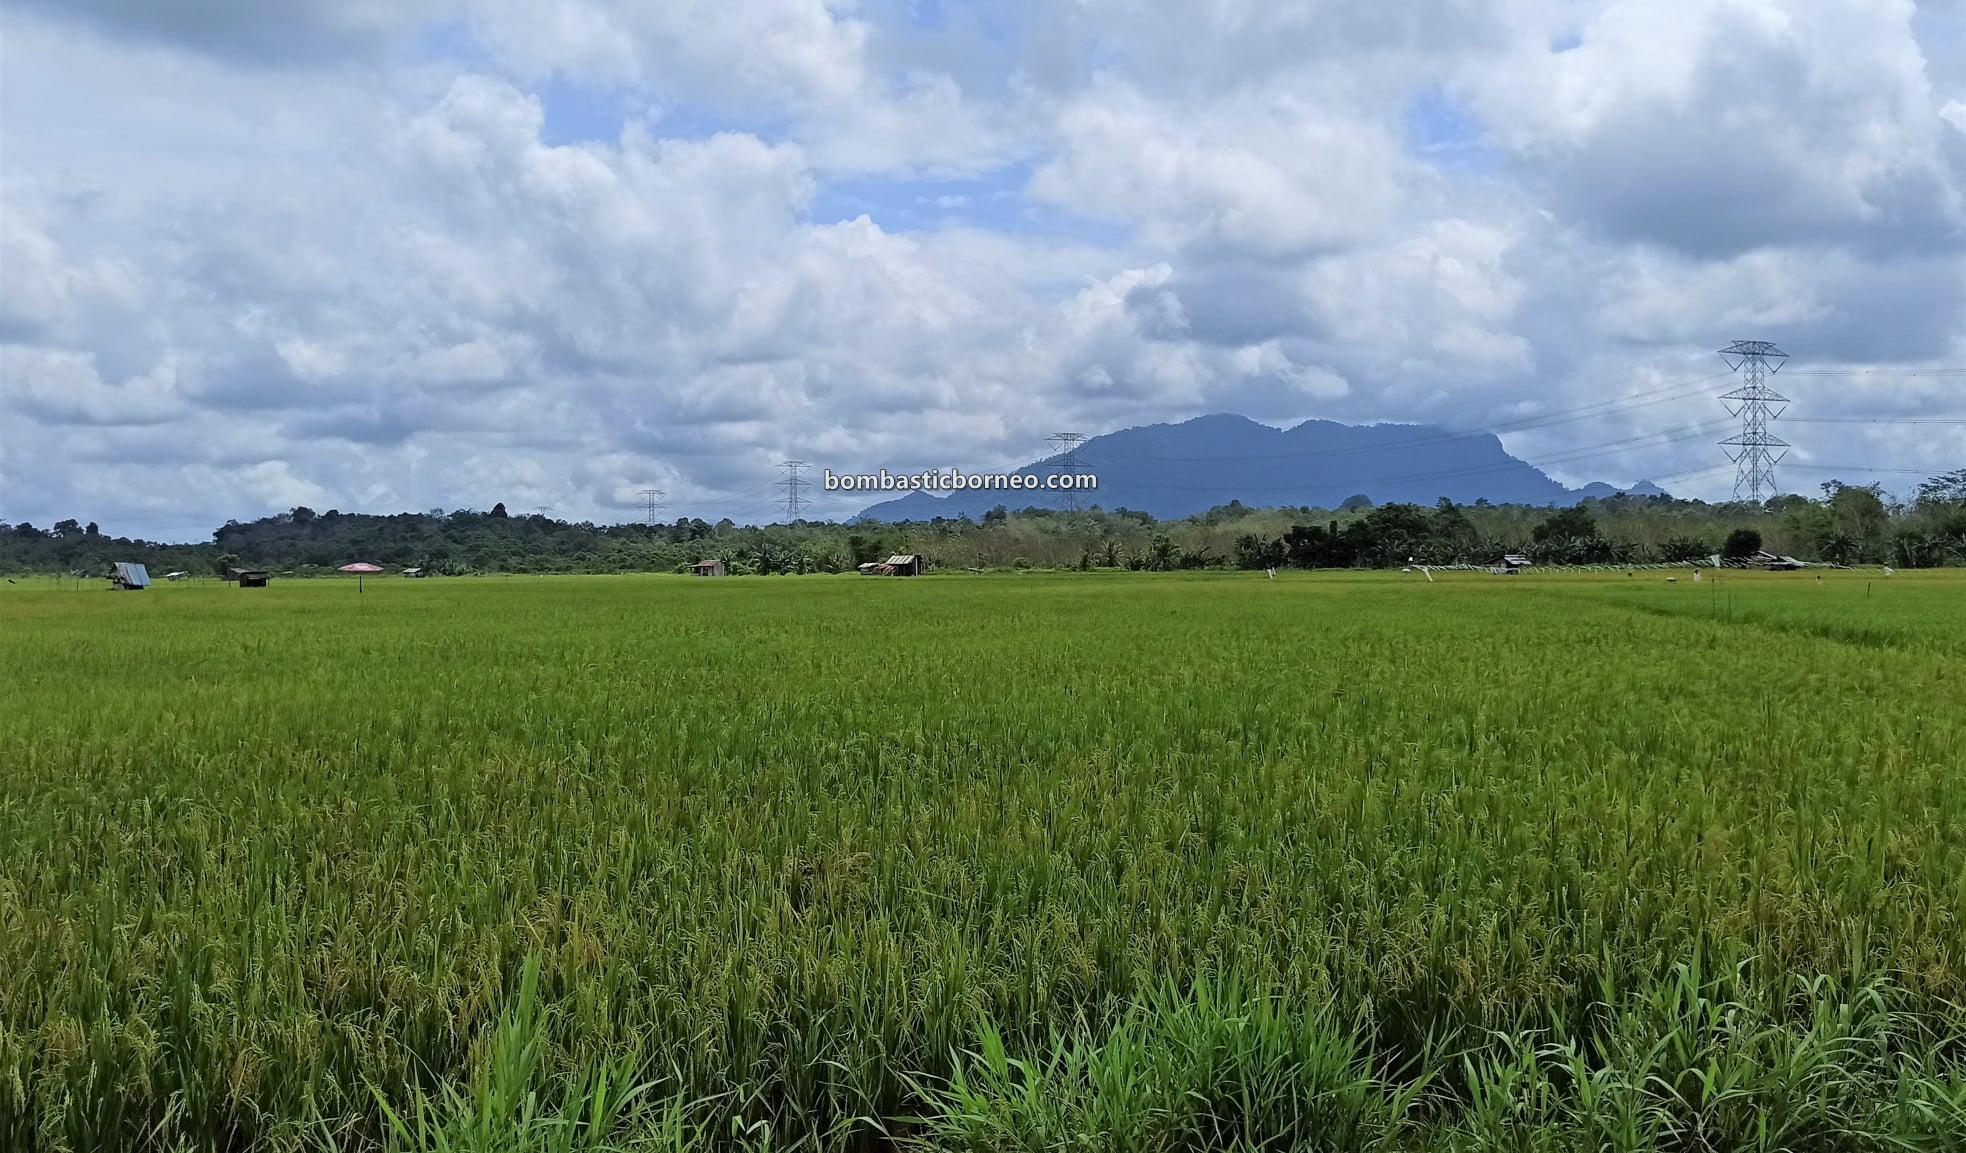 Paddy Field, Sawah Padi, Kampung Skuduk, village, Dayak Bidayuh, Serian, Sarawak, Malaysia, authentic, traditional, backpackers, nature, ecotourism, travel guide, Trans Borneo,